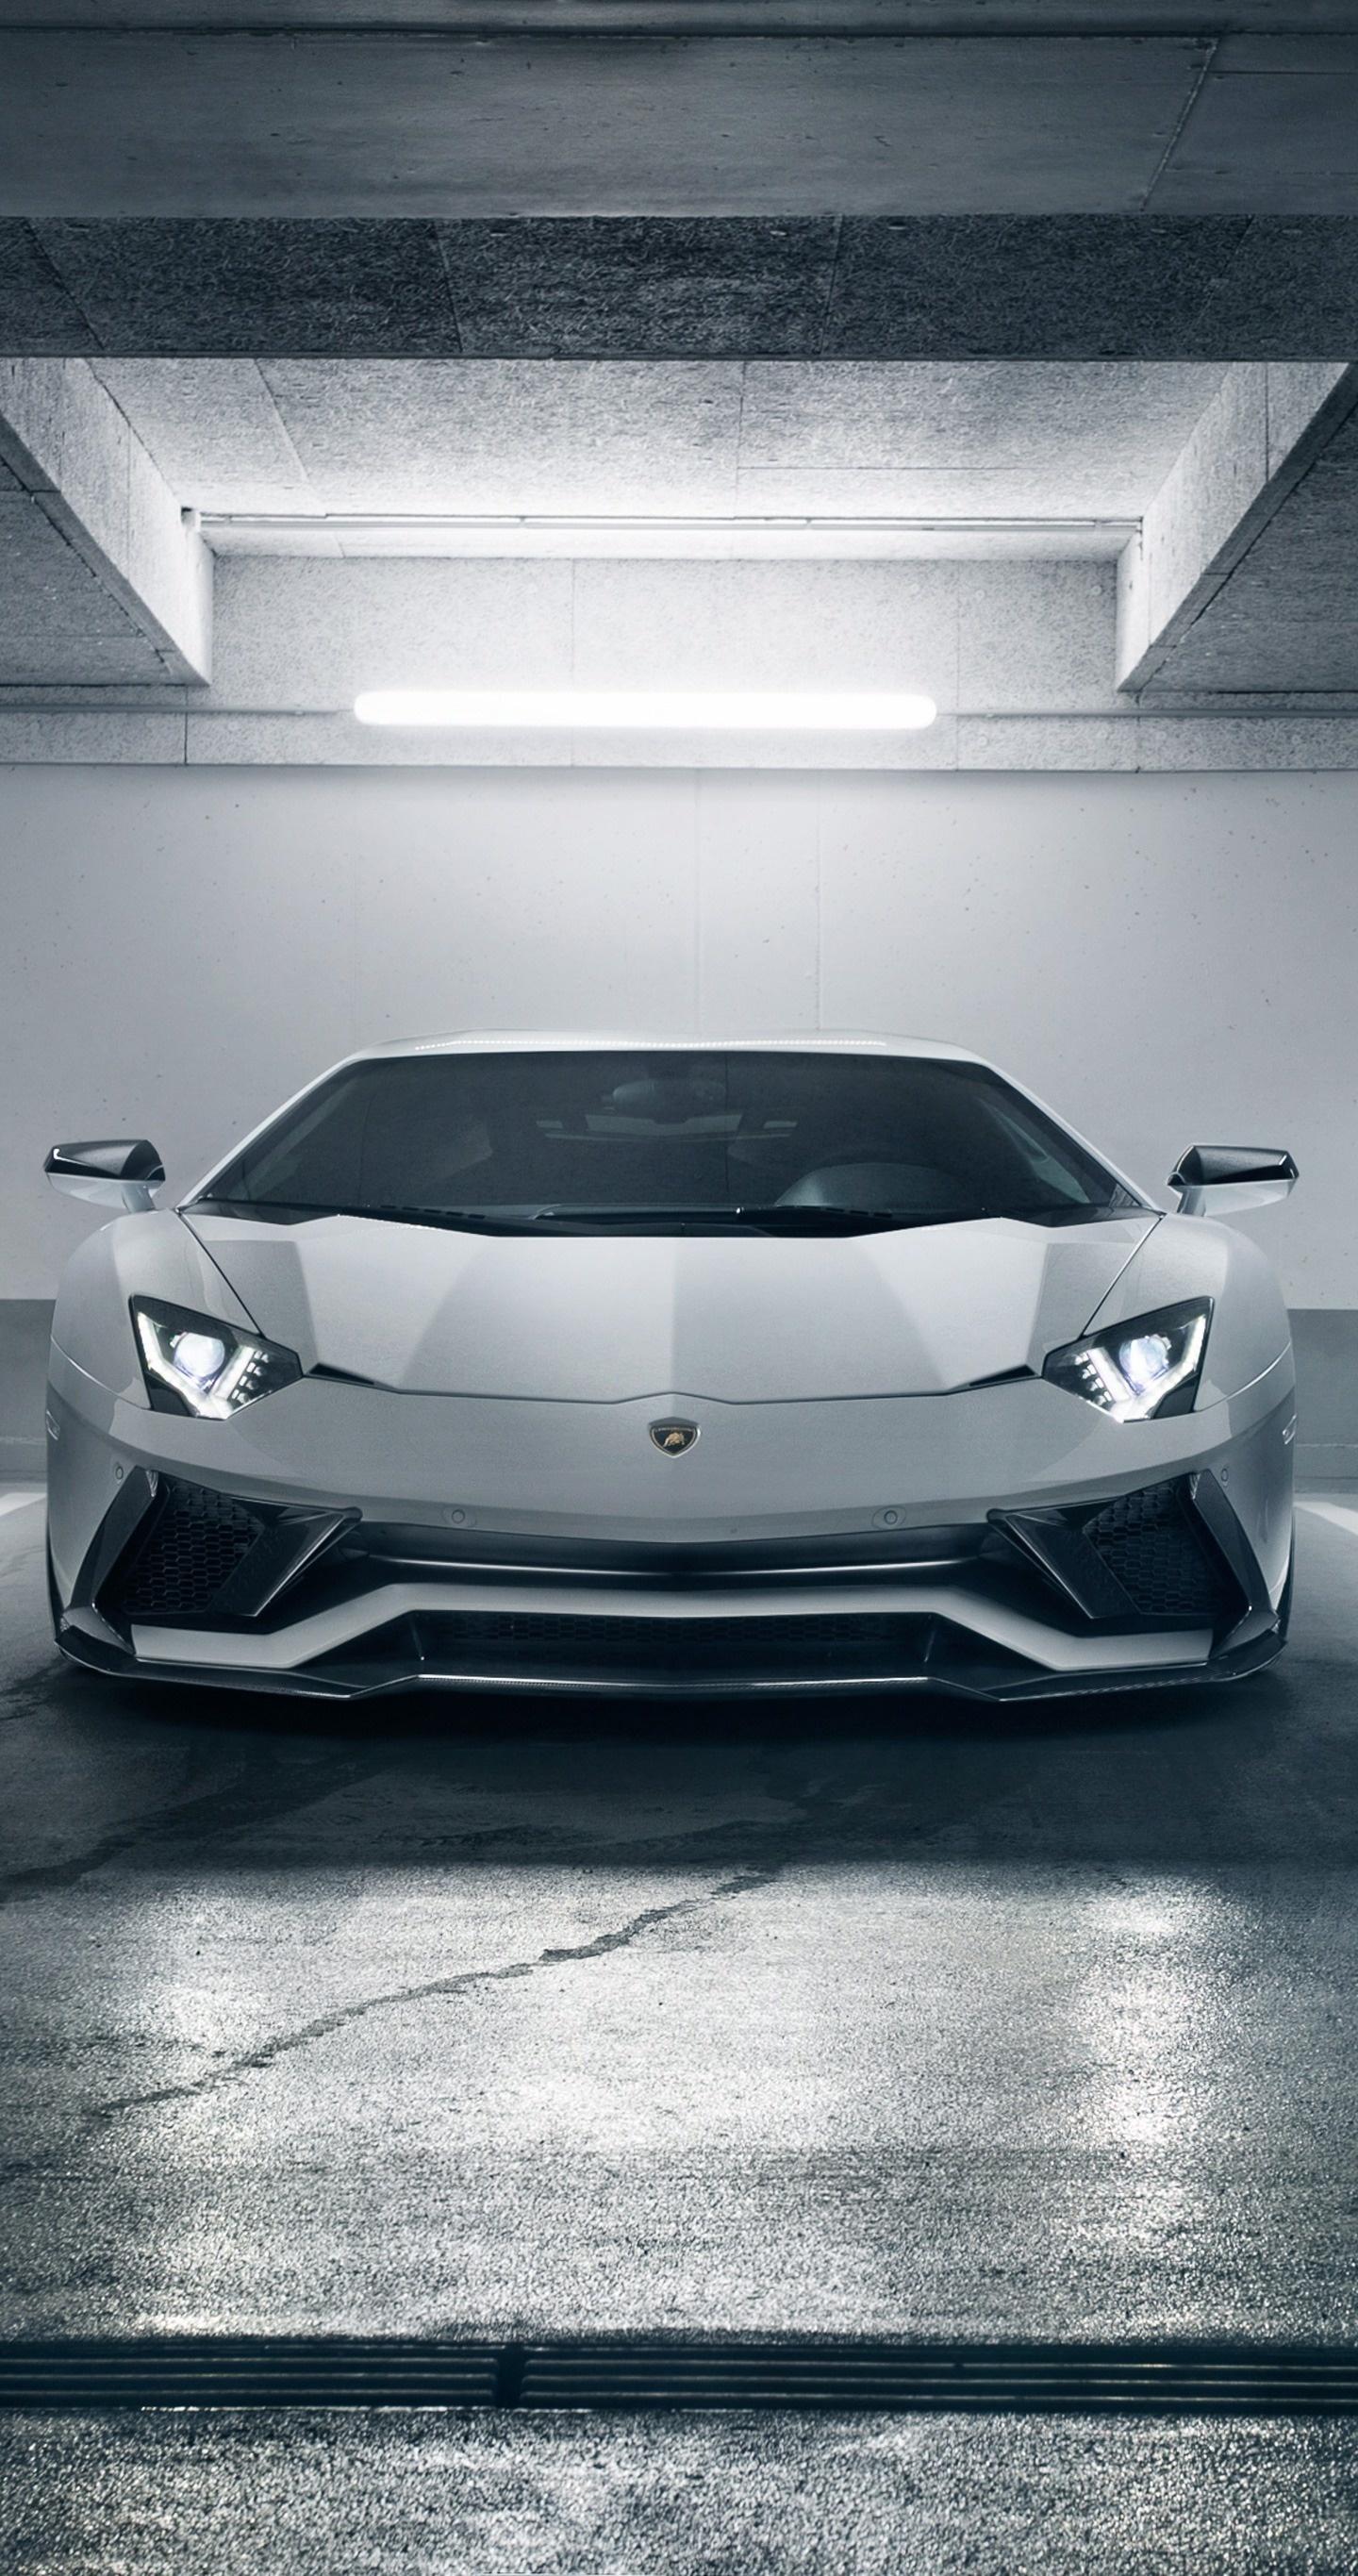 Good Download 1440x2880 Wallpaper Novitec Torado, Lamborghini Aventador S, 2018,  Front, Lg V30, Lg G6, 1440x2880 Hd Image, Background, 4847